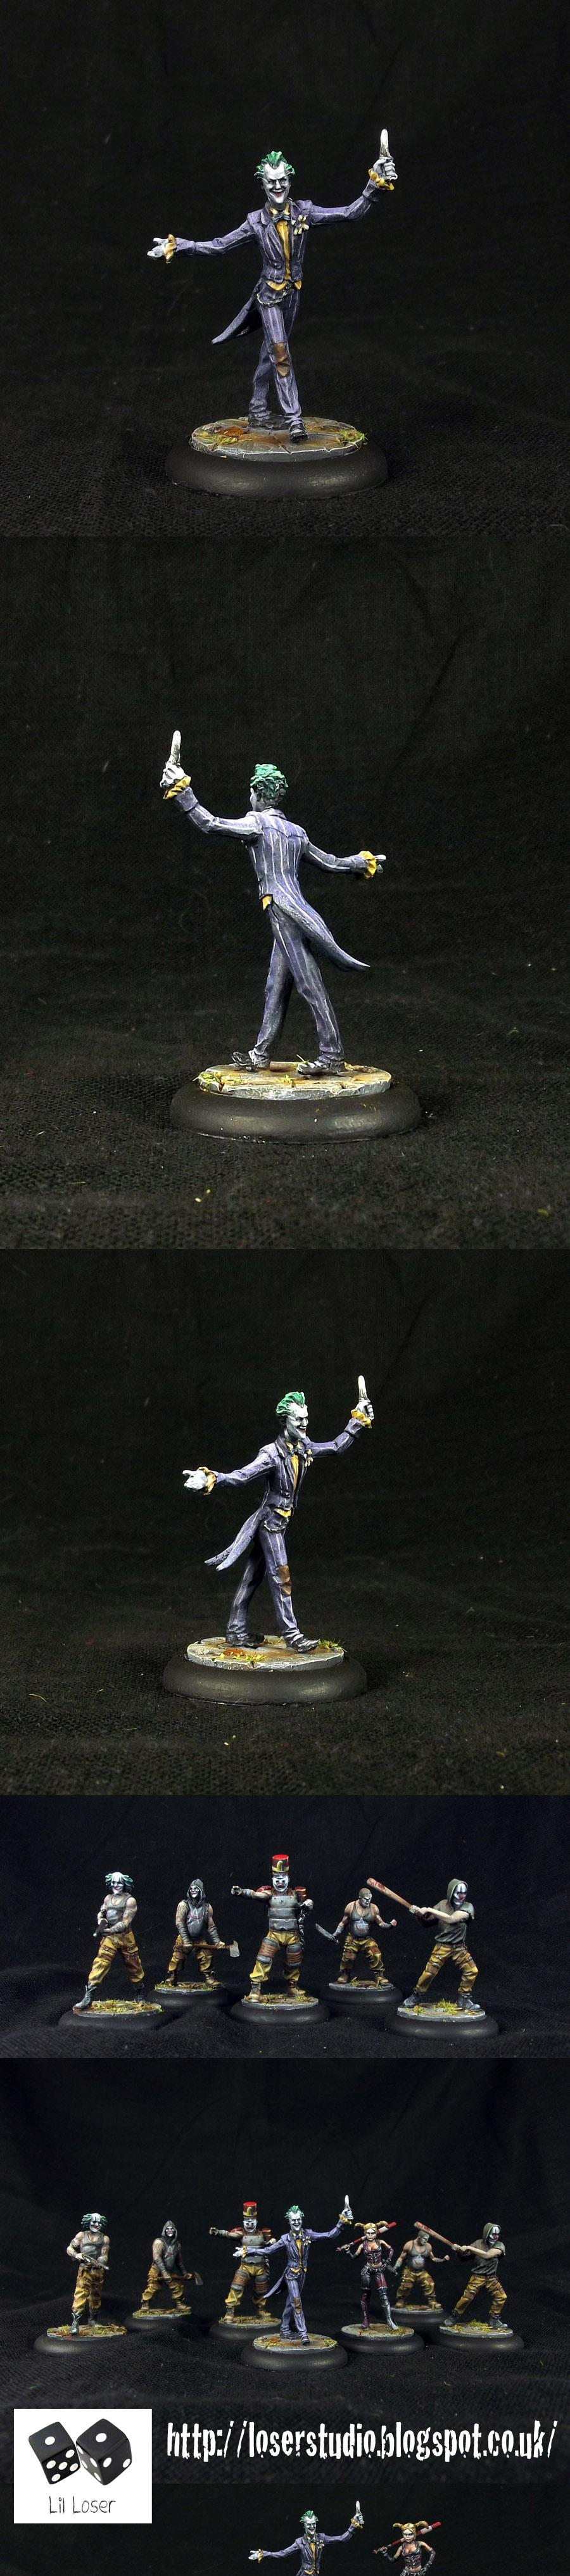 Arkham Asylum, Batman, The Joker, Why So Serious?